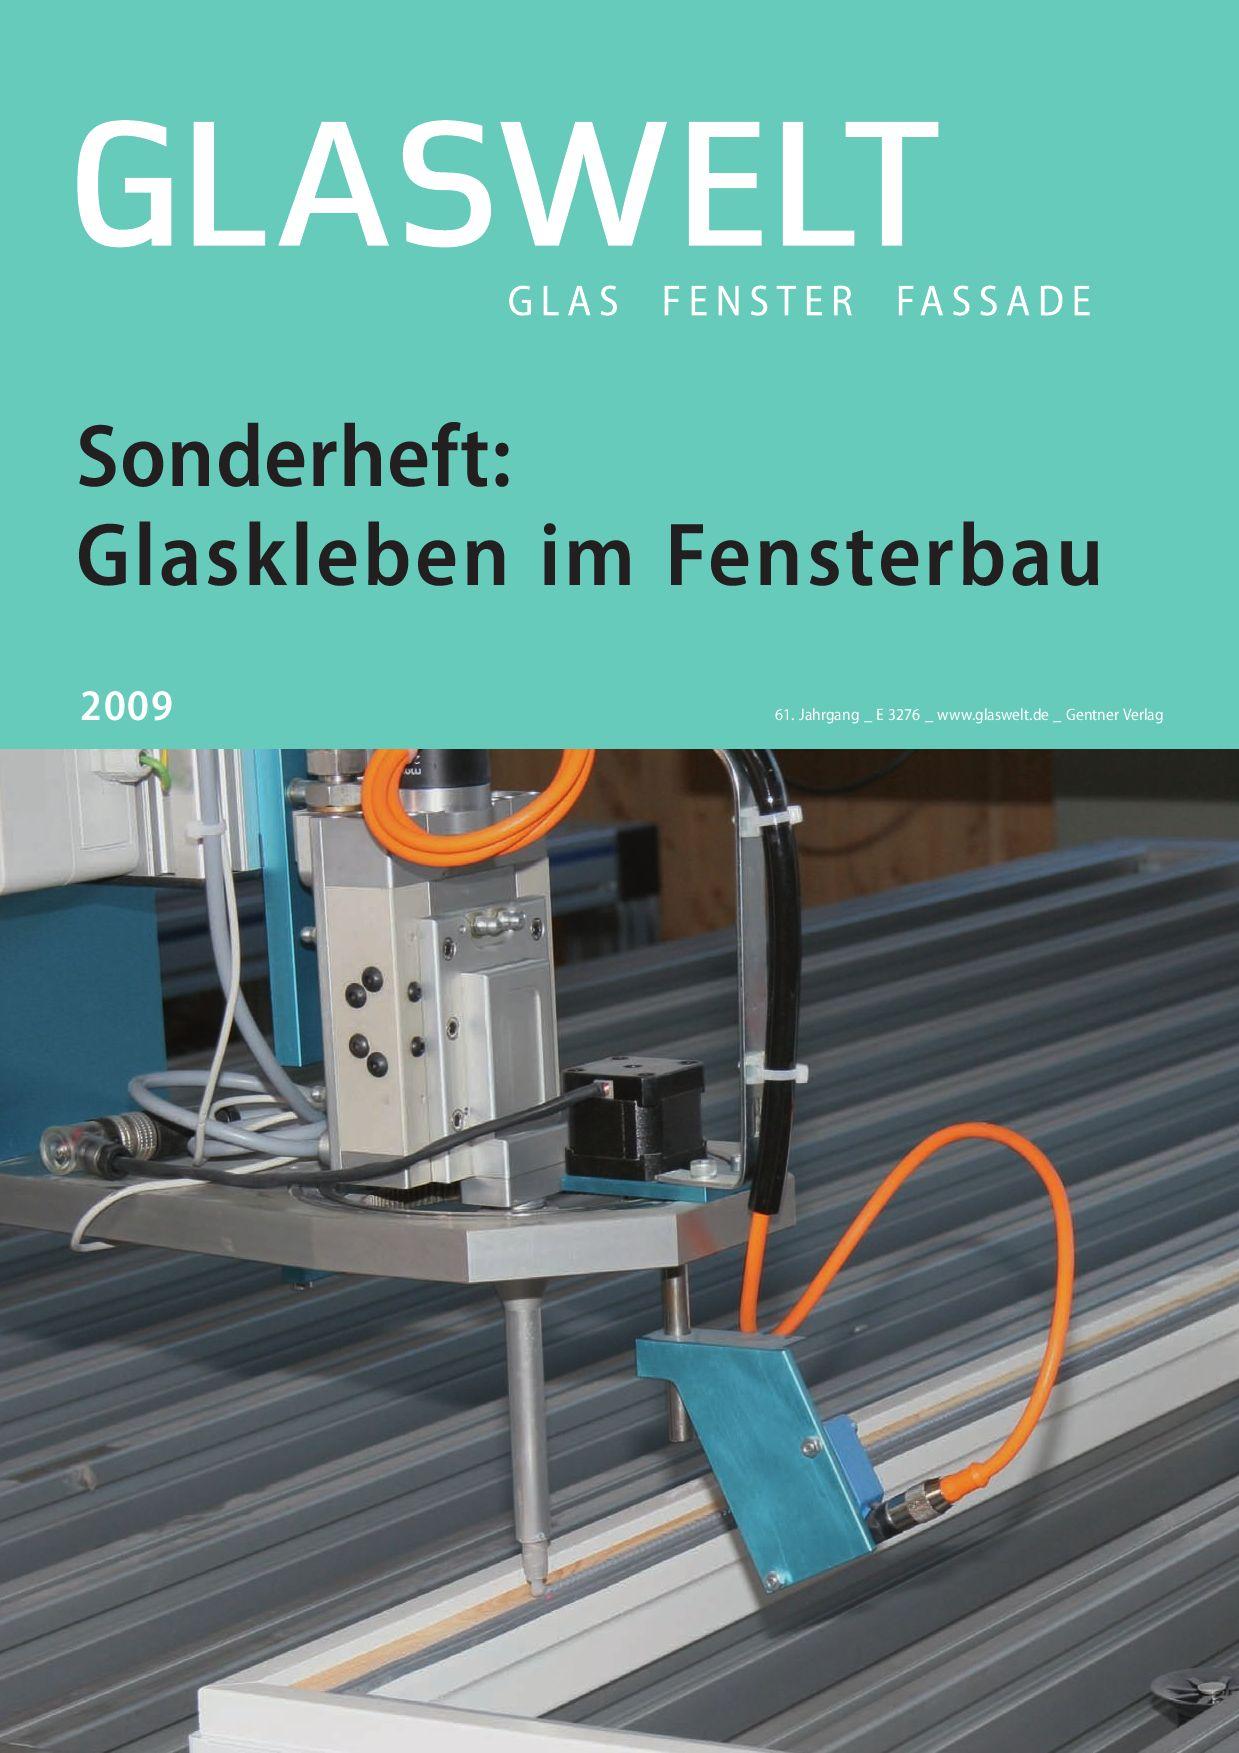 glaswelt sonderheft glaskleben by alfons w. gentner verlag gmbh & co